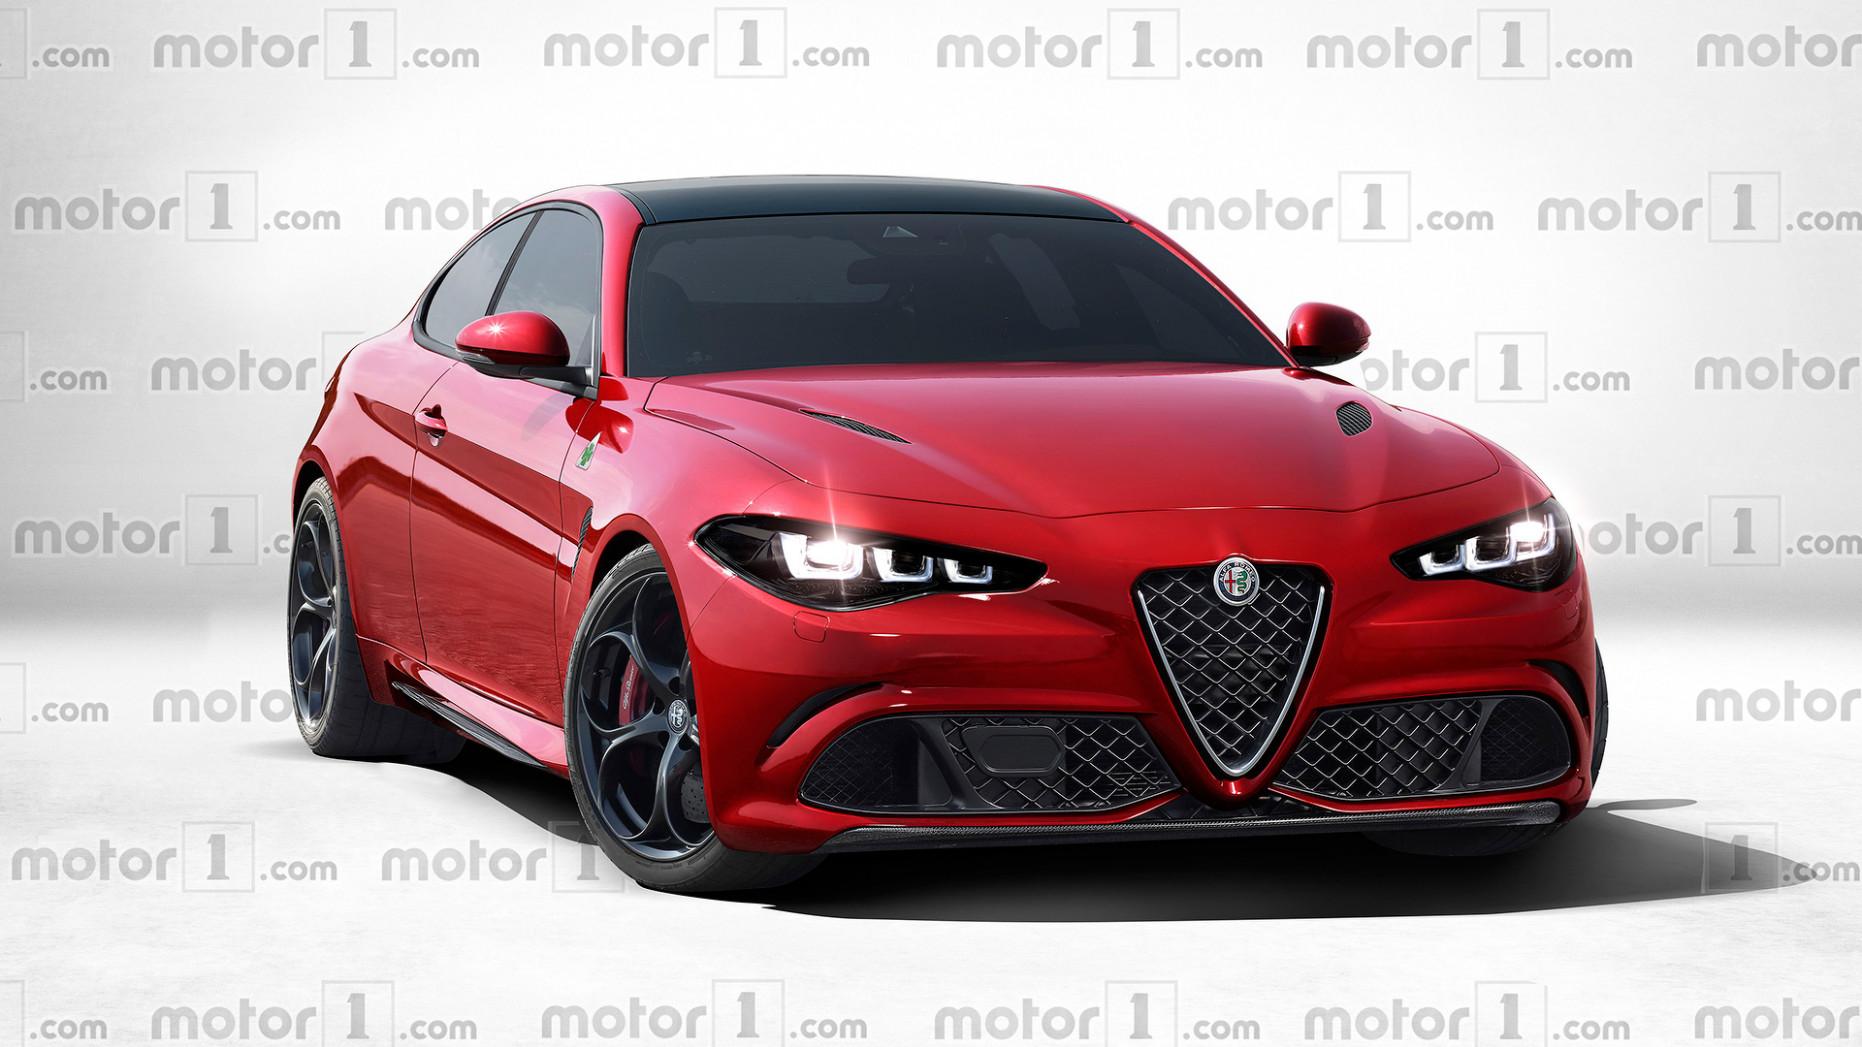 Review 2022 Alfa Romeo Giulietta